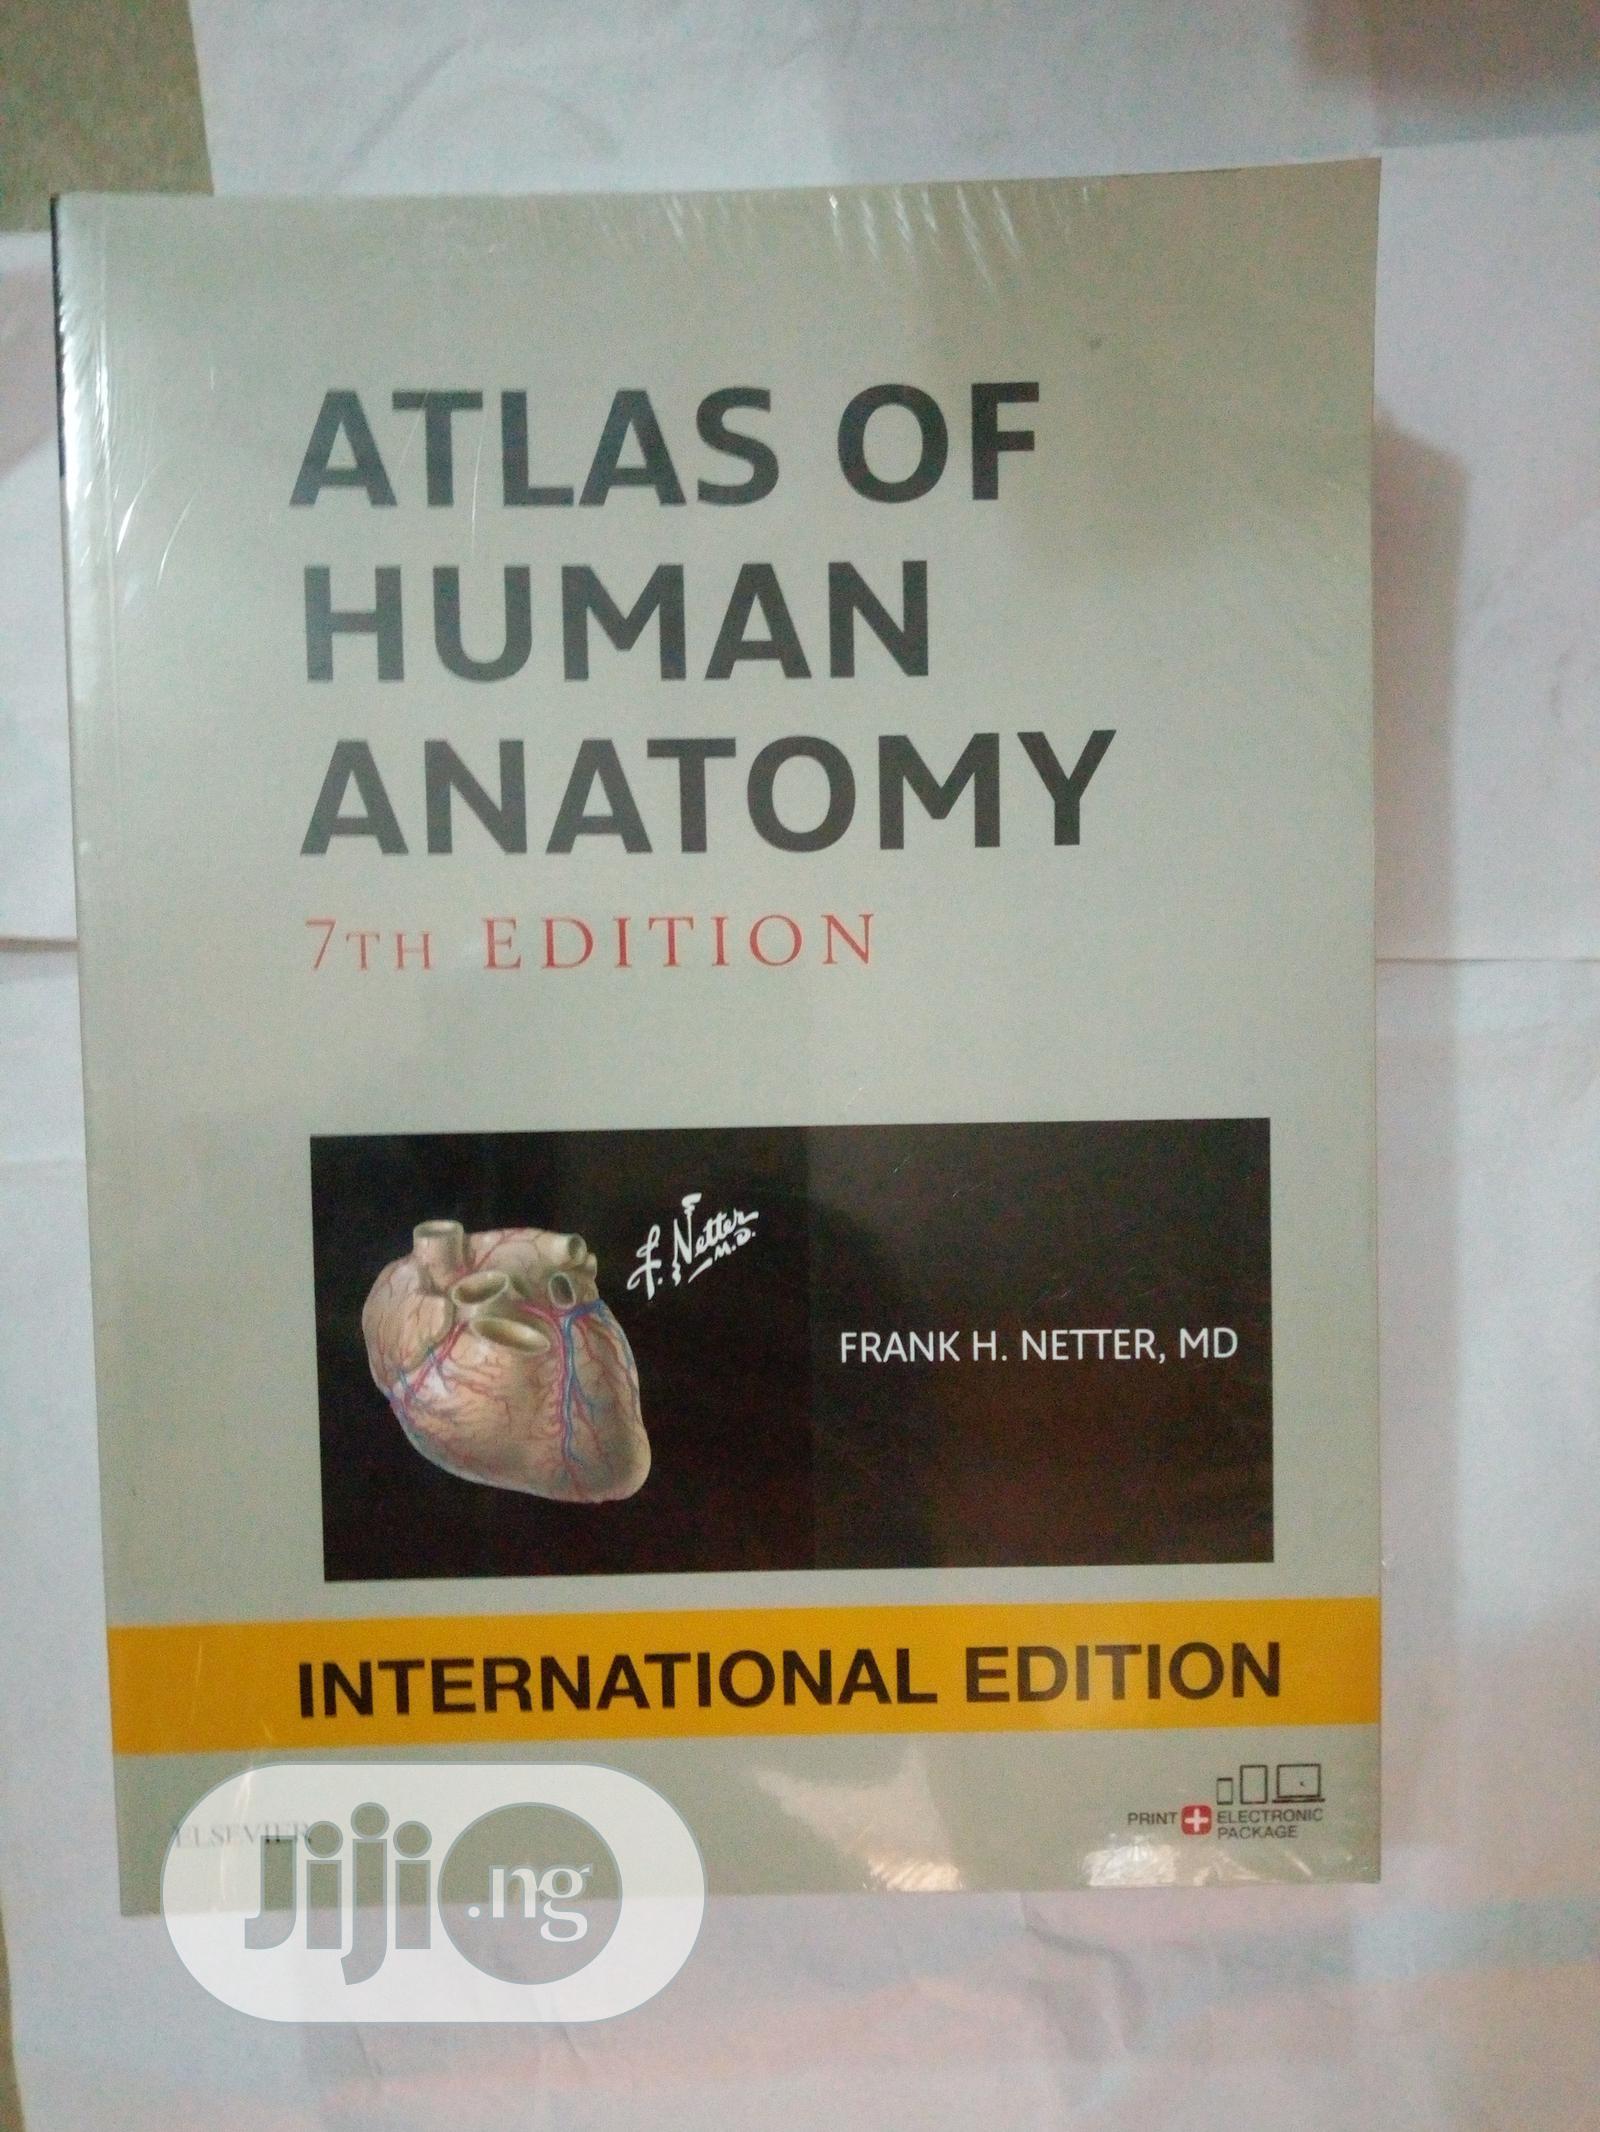 Human Atlas of Anatomy